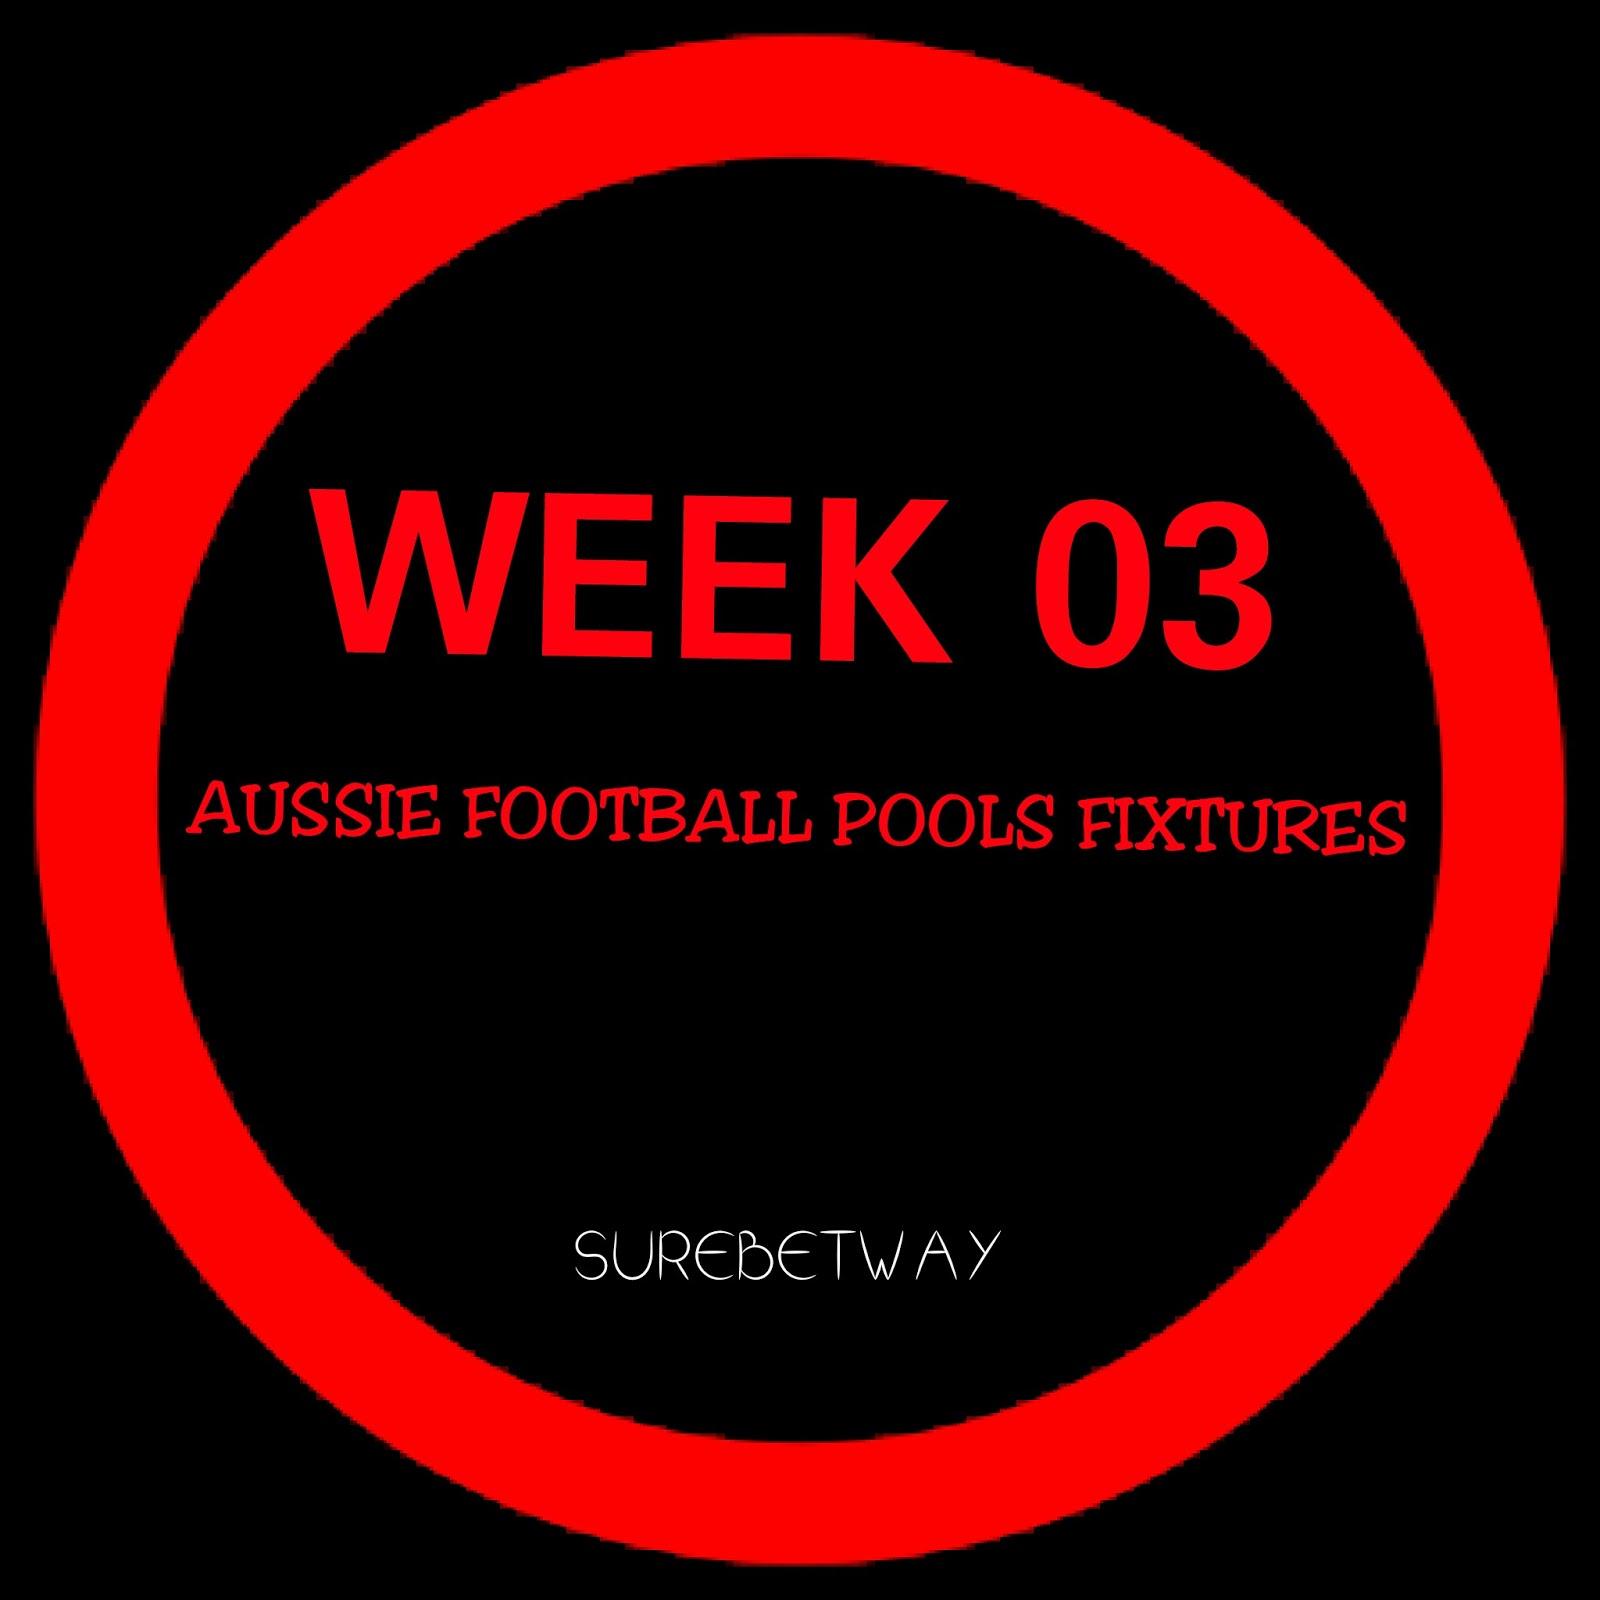 WEEK 03: AUSSIE ADVANCE FOOTBALL POOLS FIXTURES